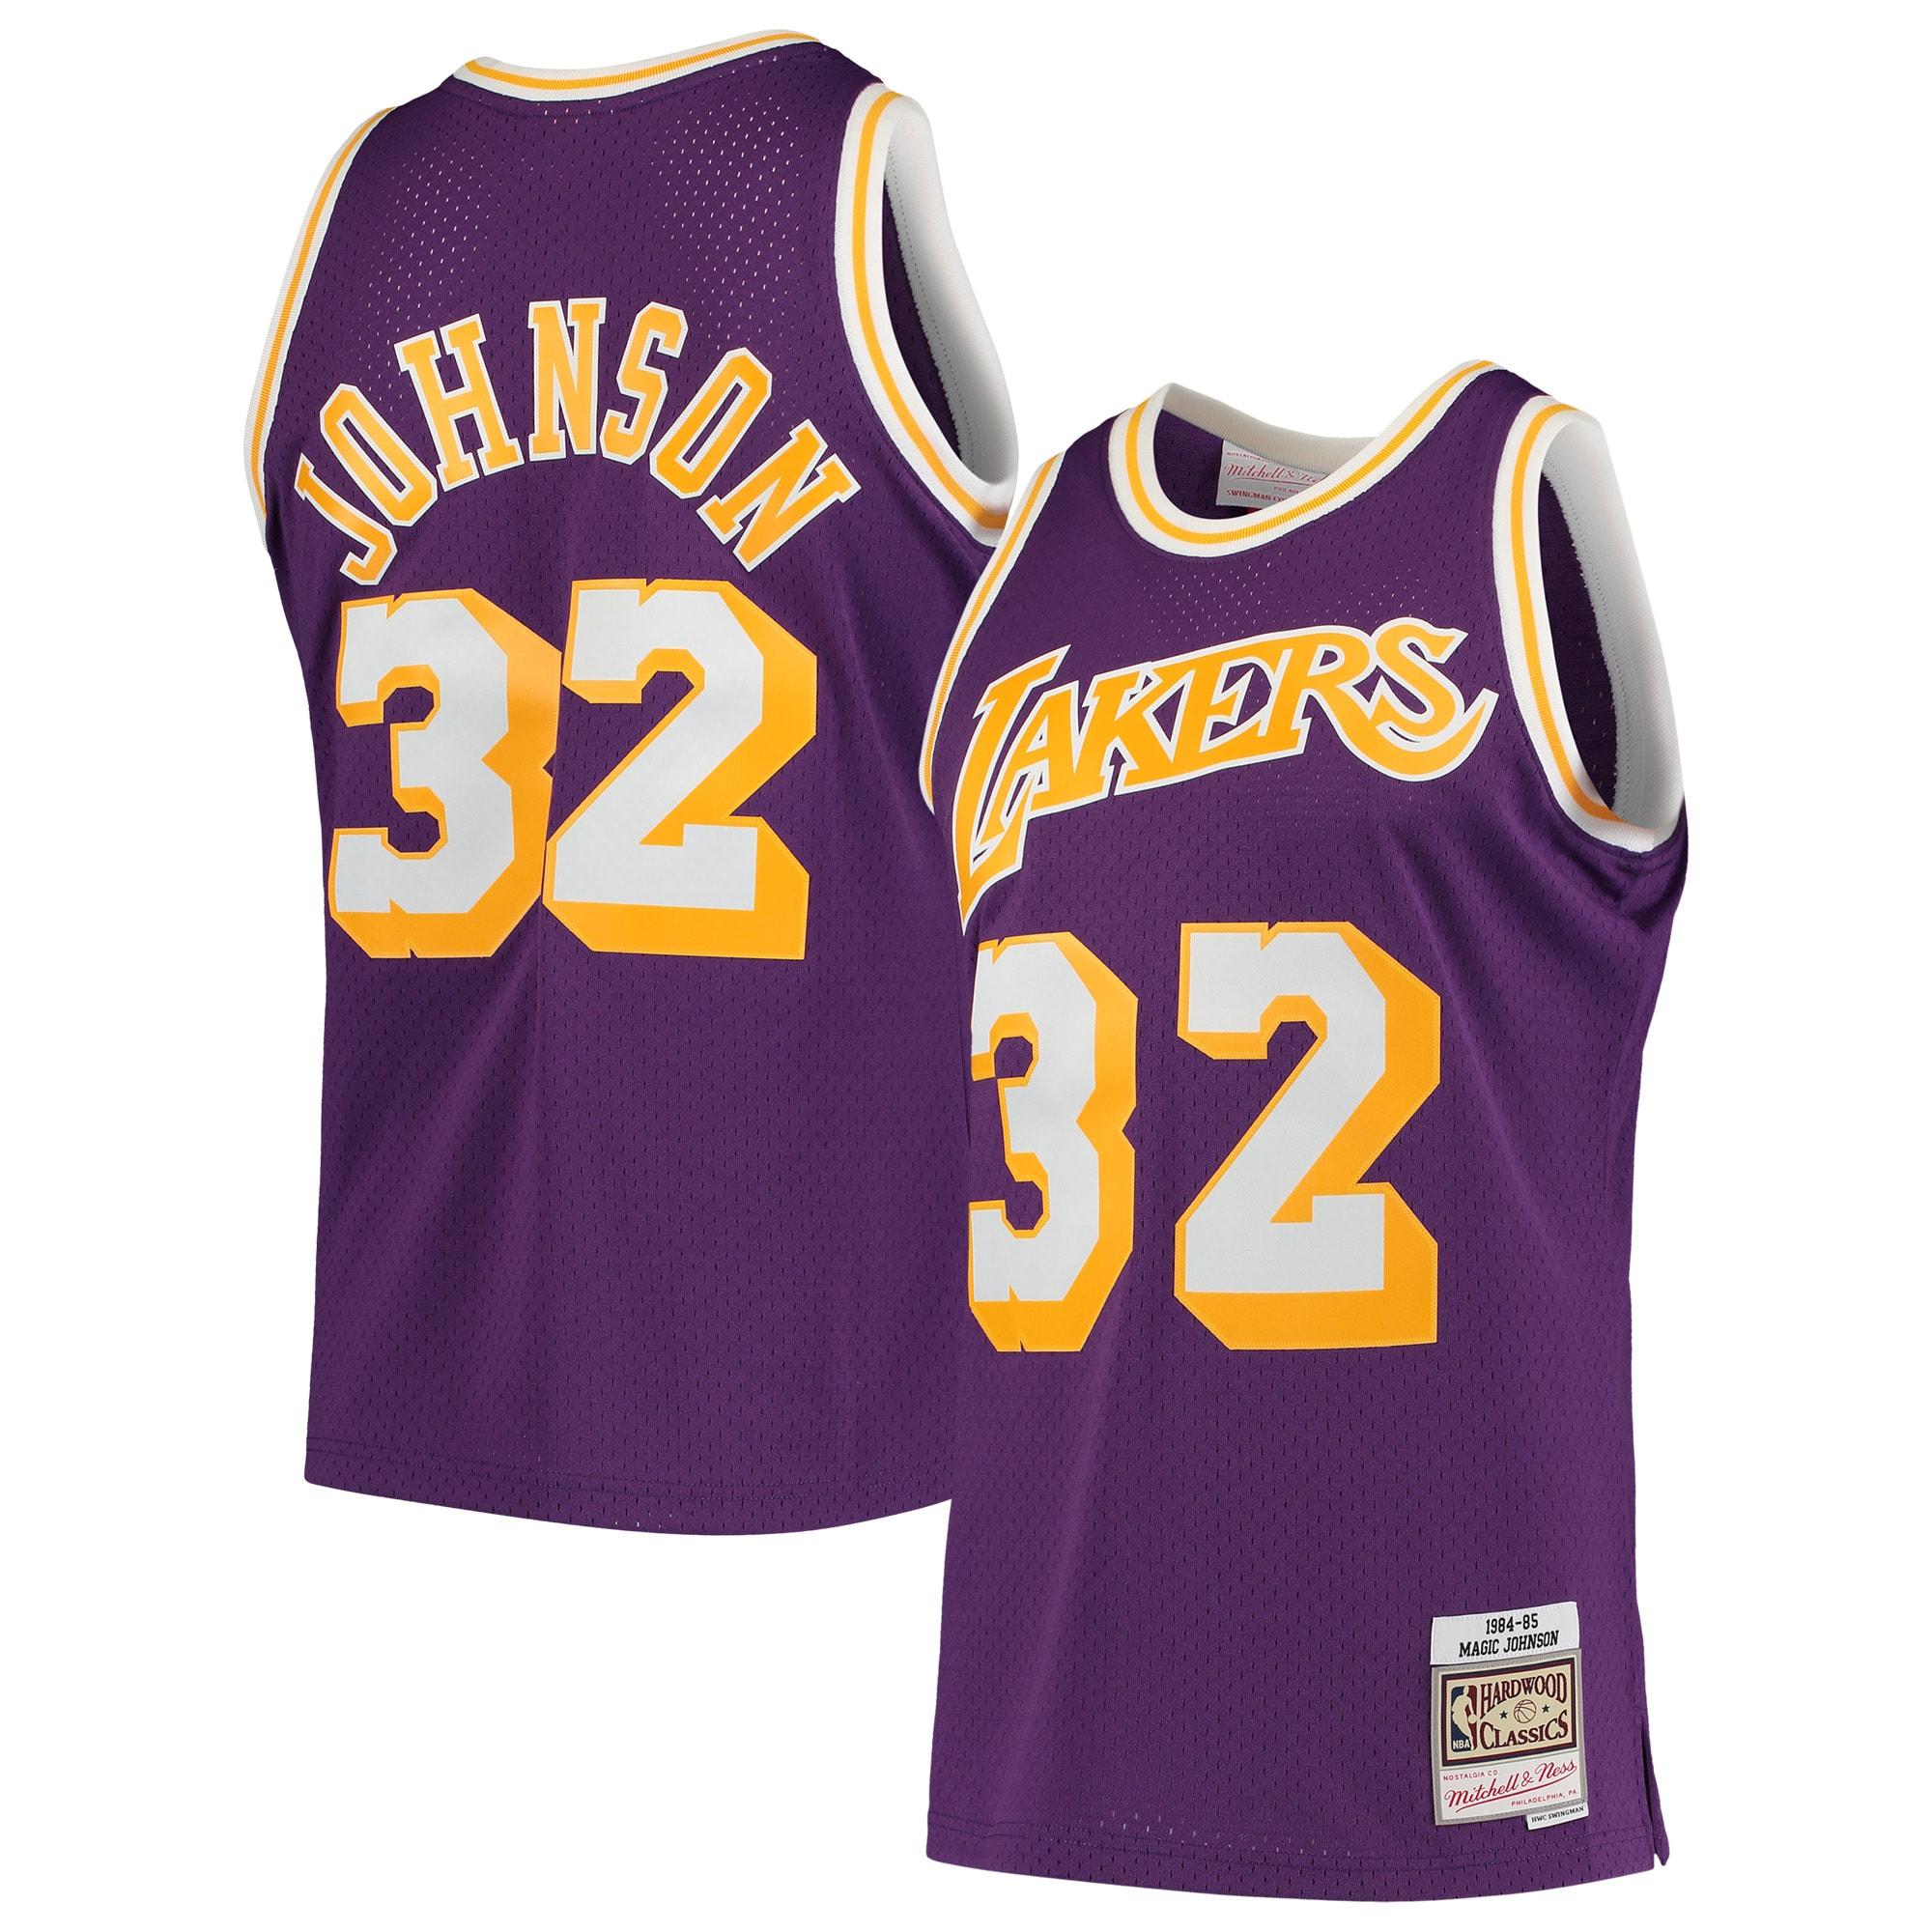 Magic Johnson Los Angeles Lakers Mitchell & Ness 1984-85 Hardwood Classics Swingman Player Jersey - Purple